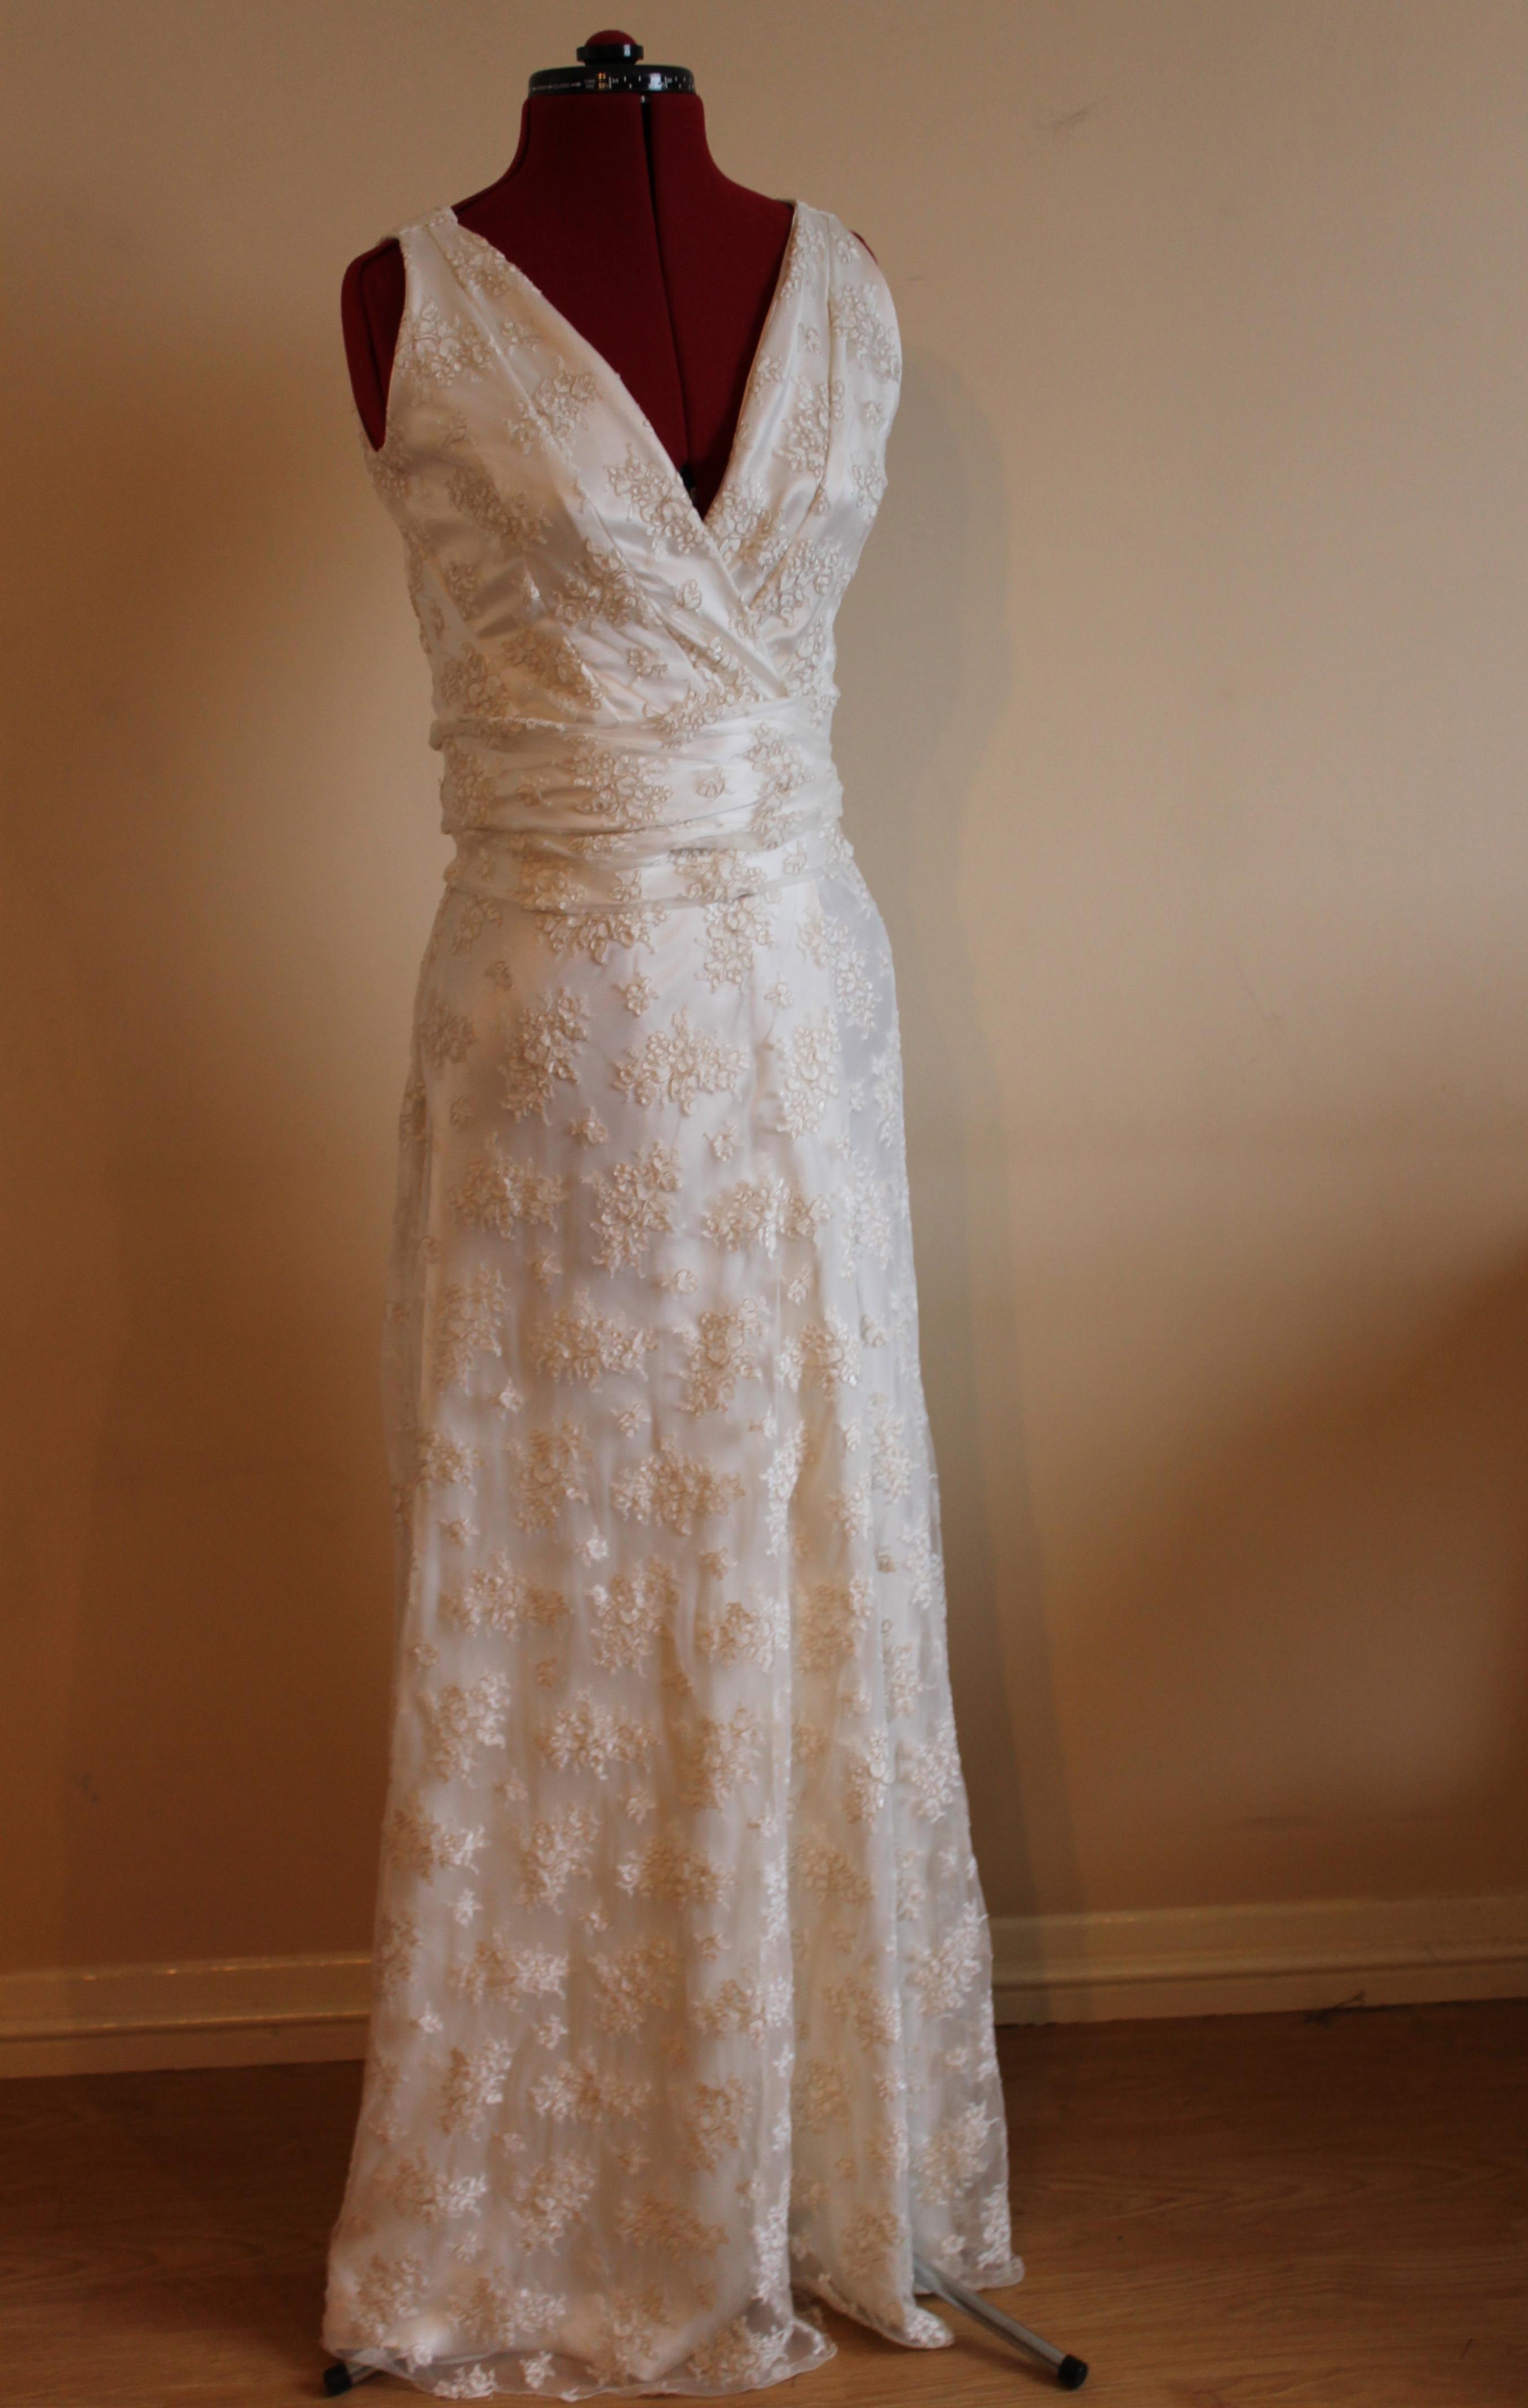 Wrap around lace vintage style wedding dress the vintage for Old style wedding dresses